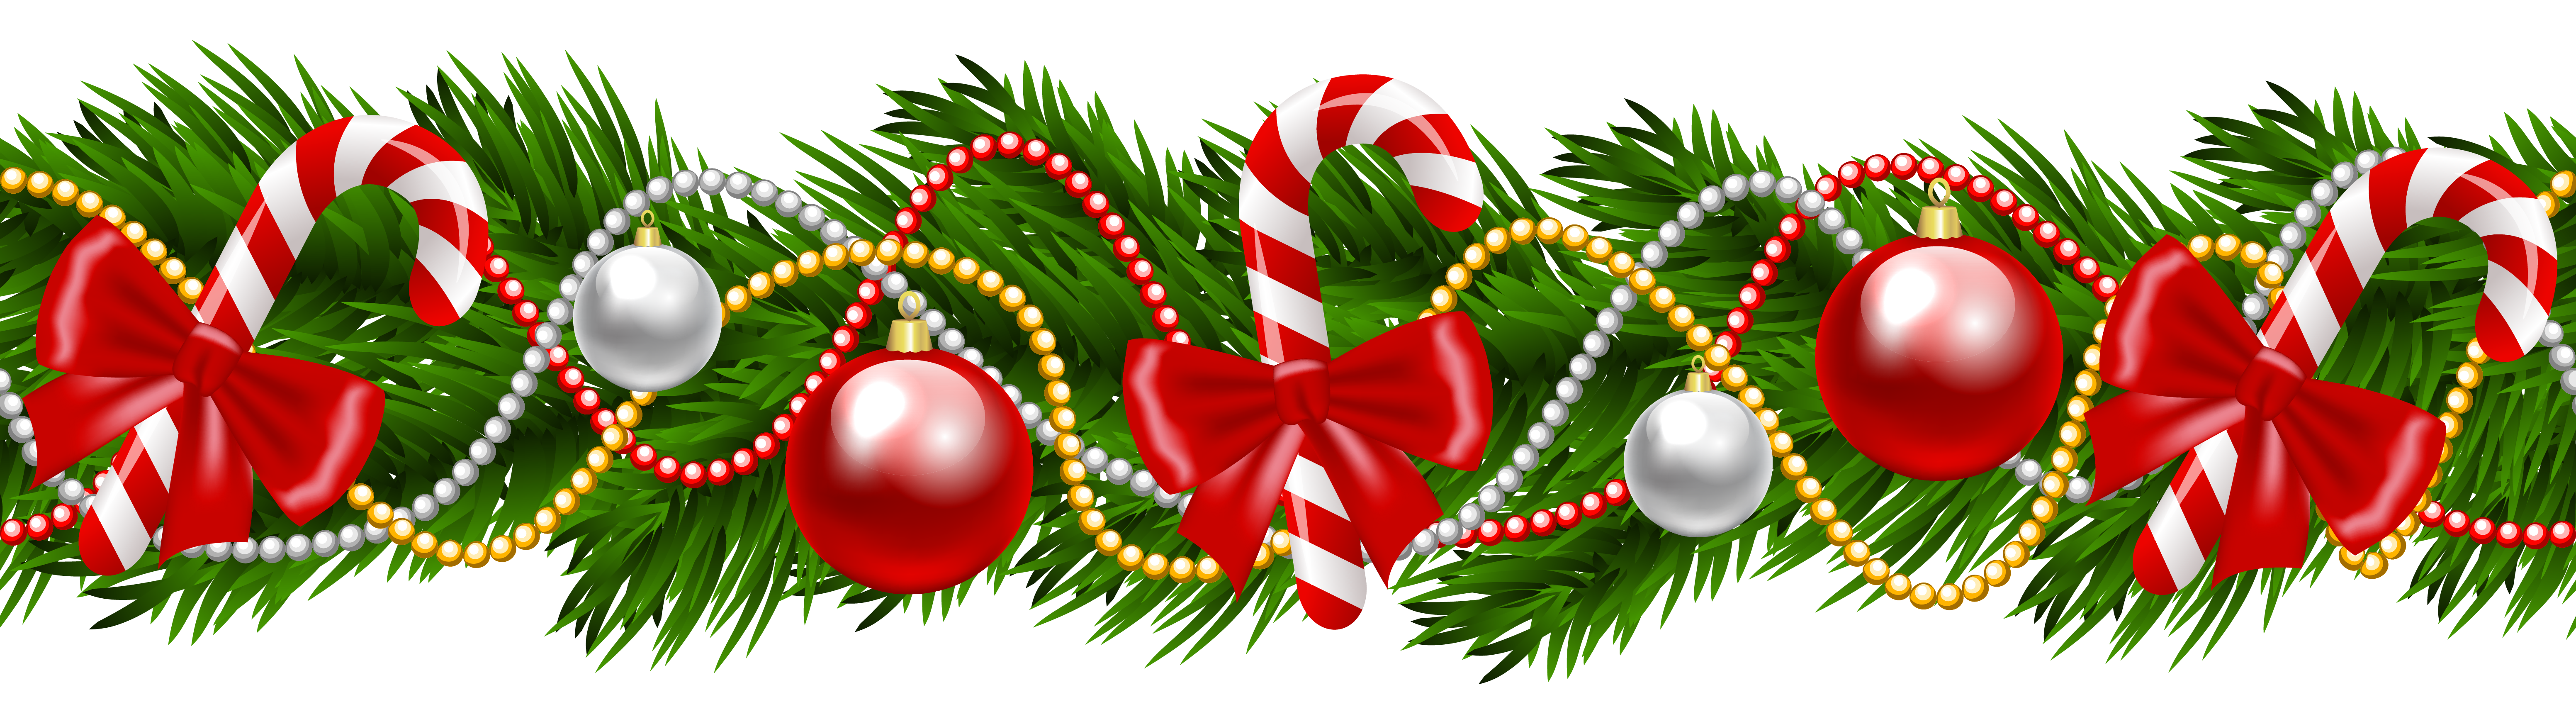 Candy Cane clipart christmas wreath Christmas Christmas Garland christmas garland